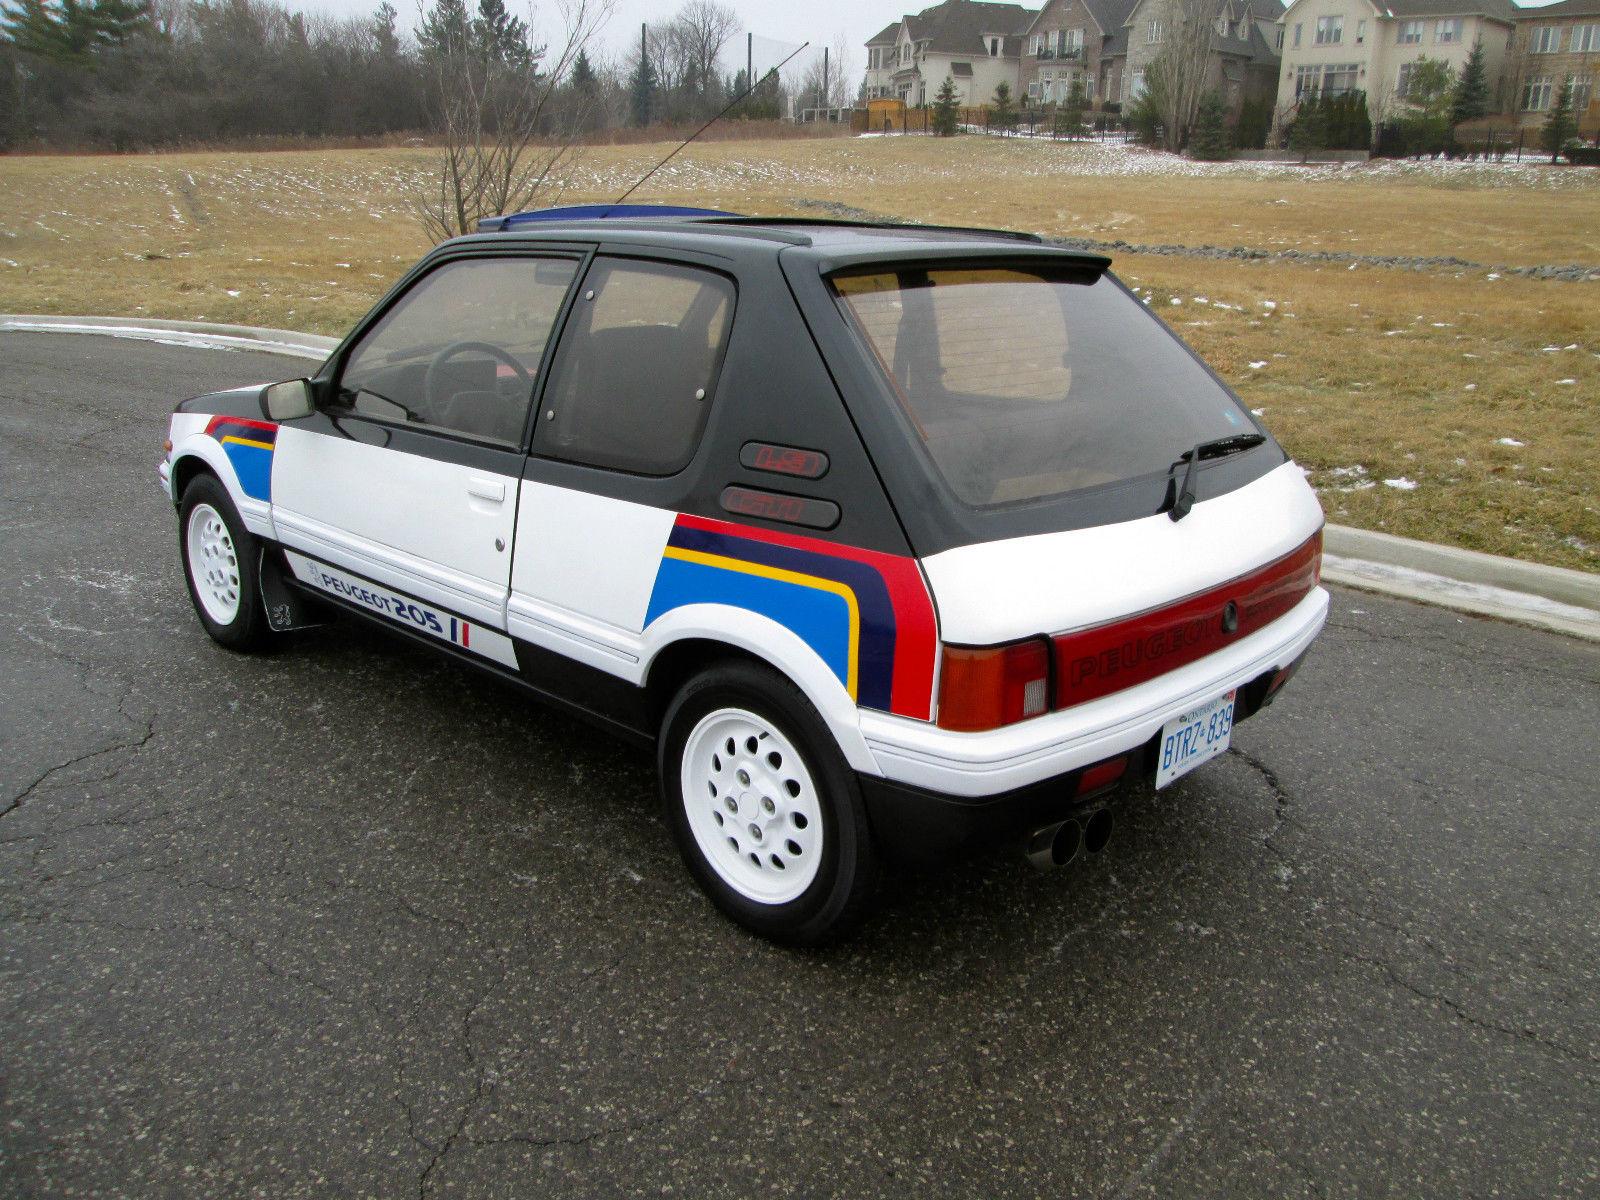 88 peugeot 205 gti 1 9 rally stripes 33k orig miles timecapsule norust usa legal. Black Bedroom Furniture Sets. Home Design Ideas